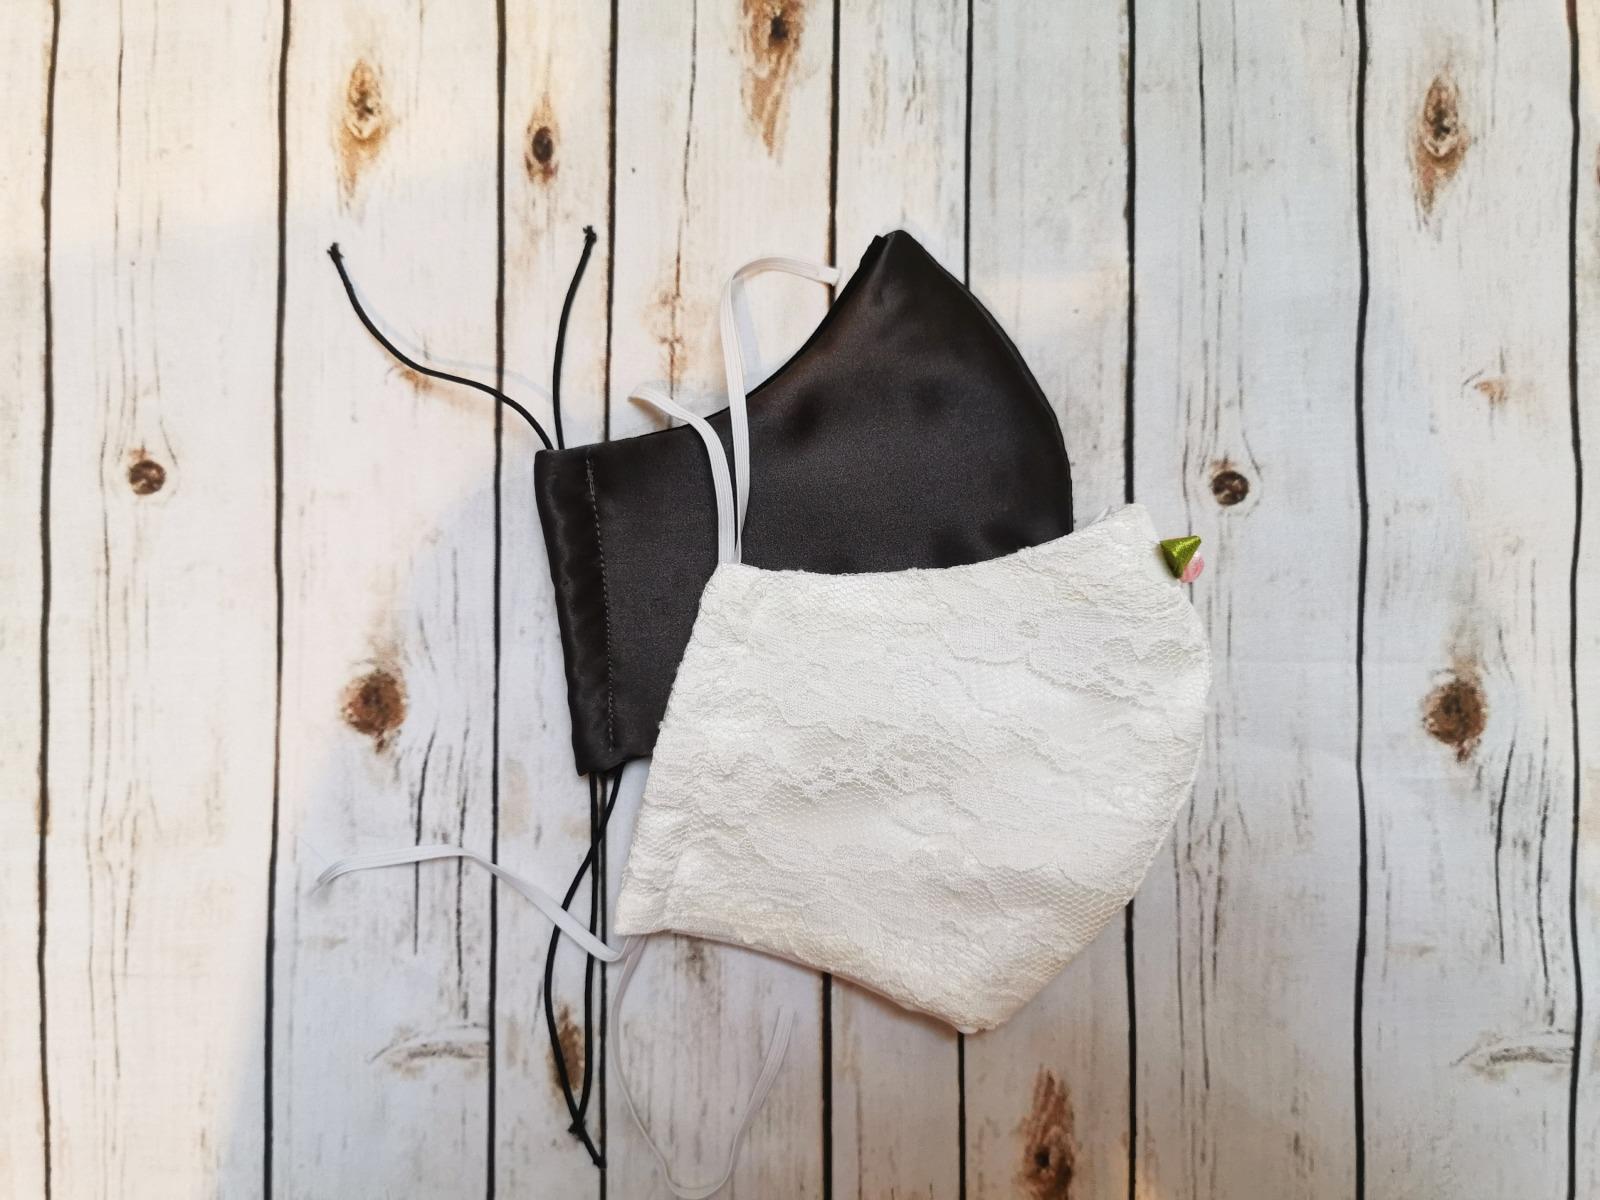 2er SET Paar Hochzeit - Alltagsmaske